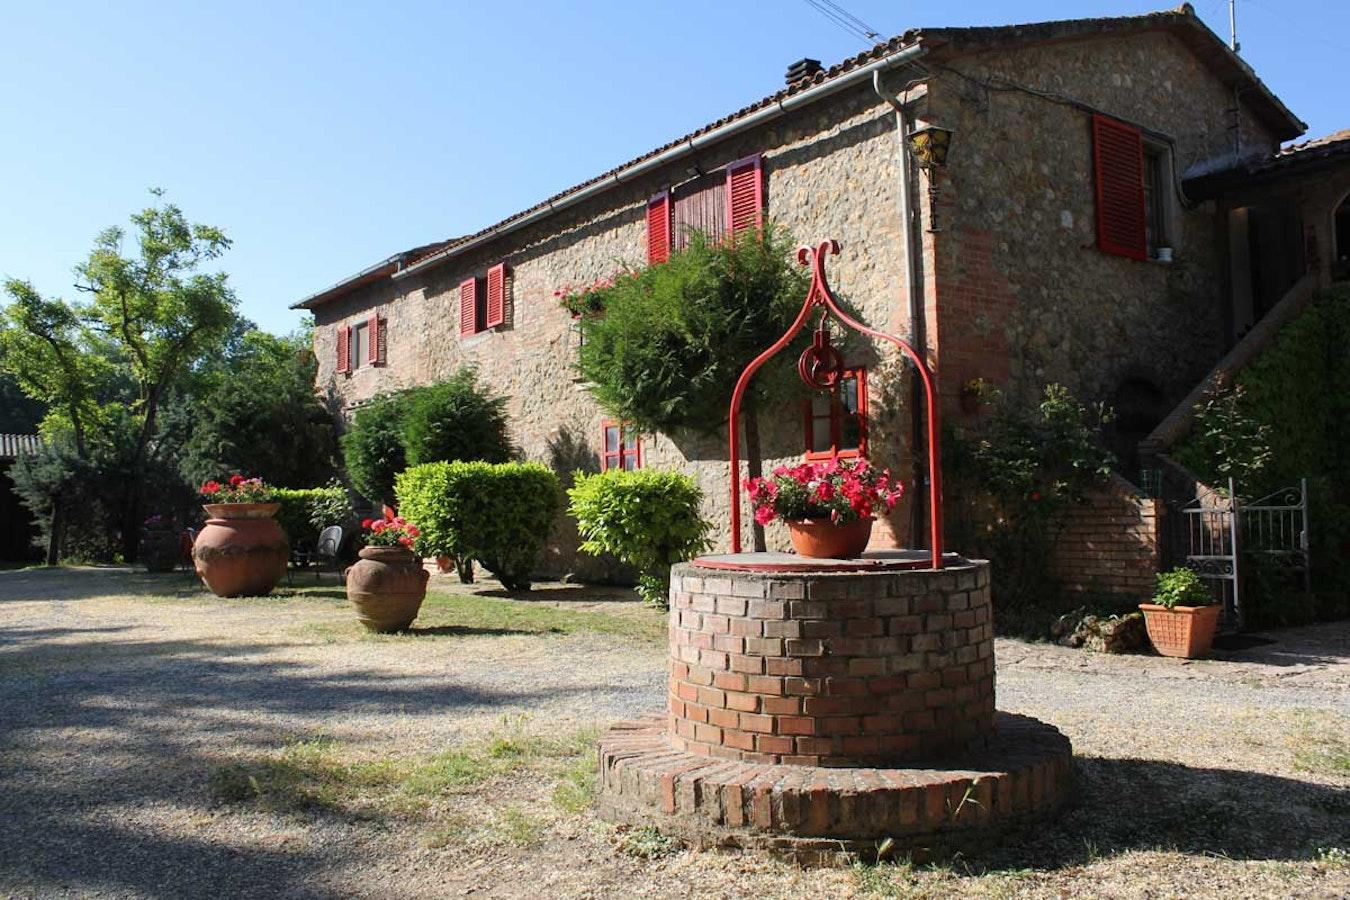 Agriturismo La Selva,stylish rural rooms & apartments in Siena